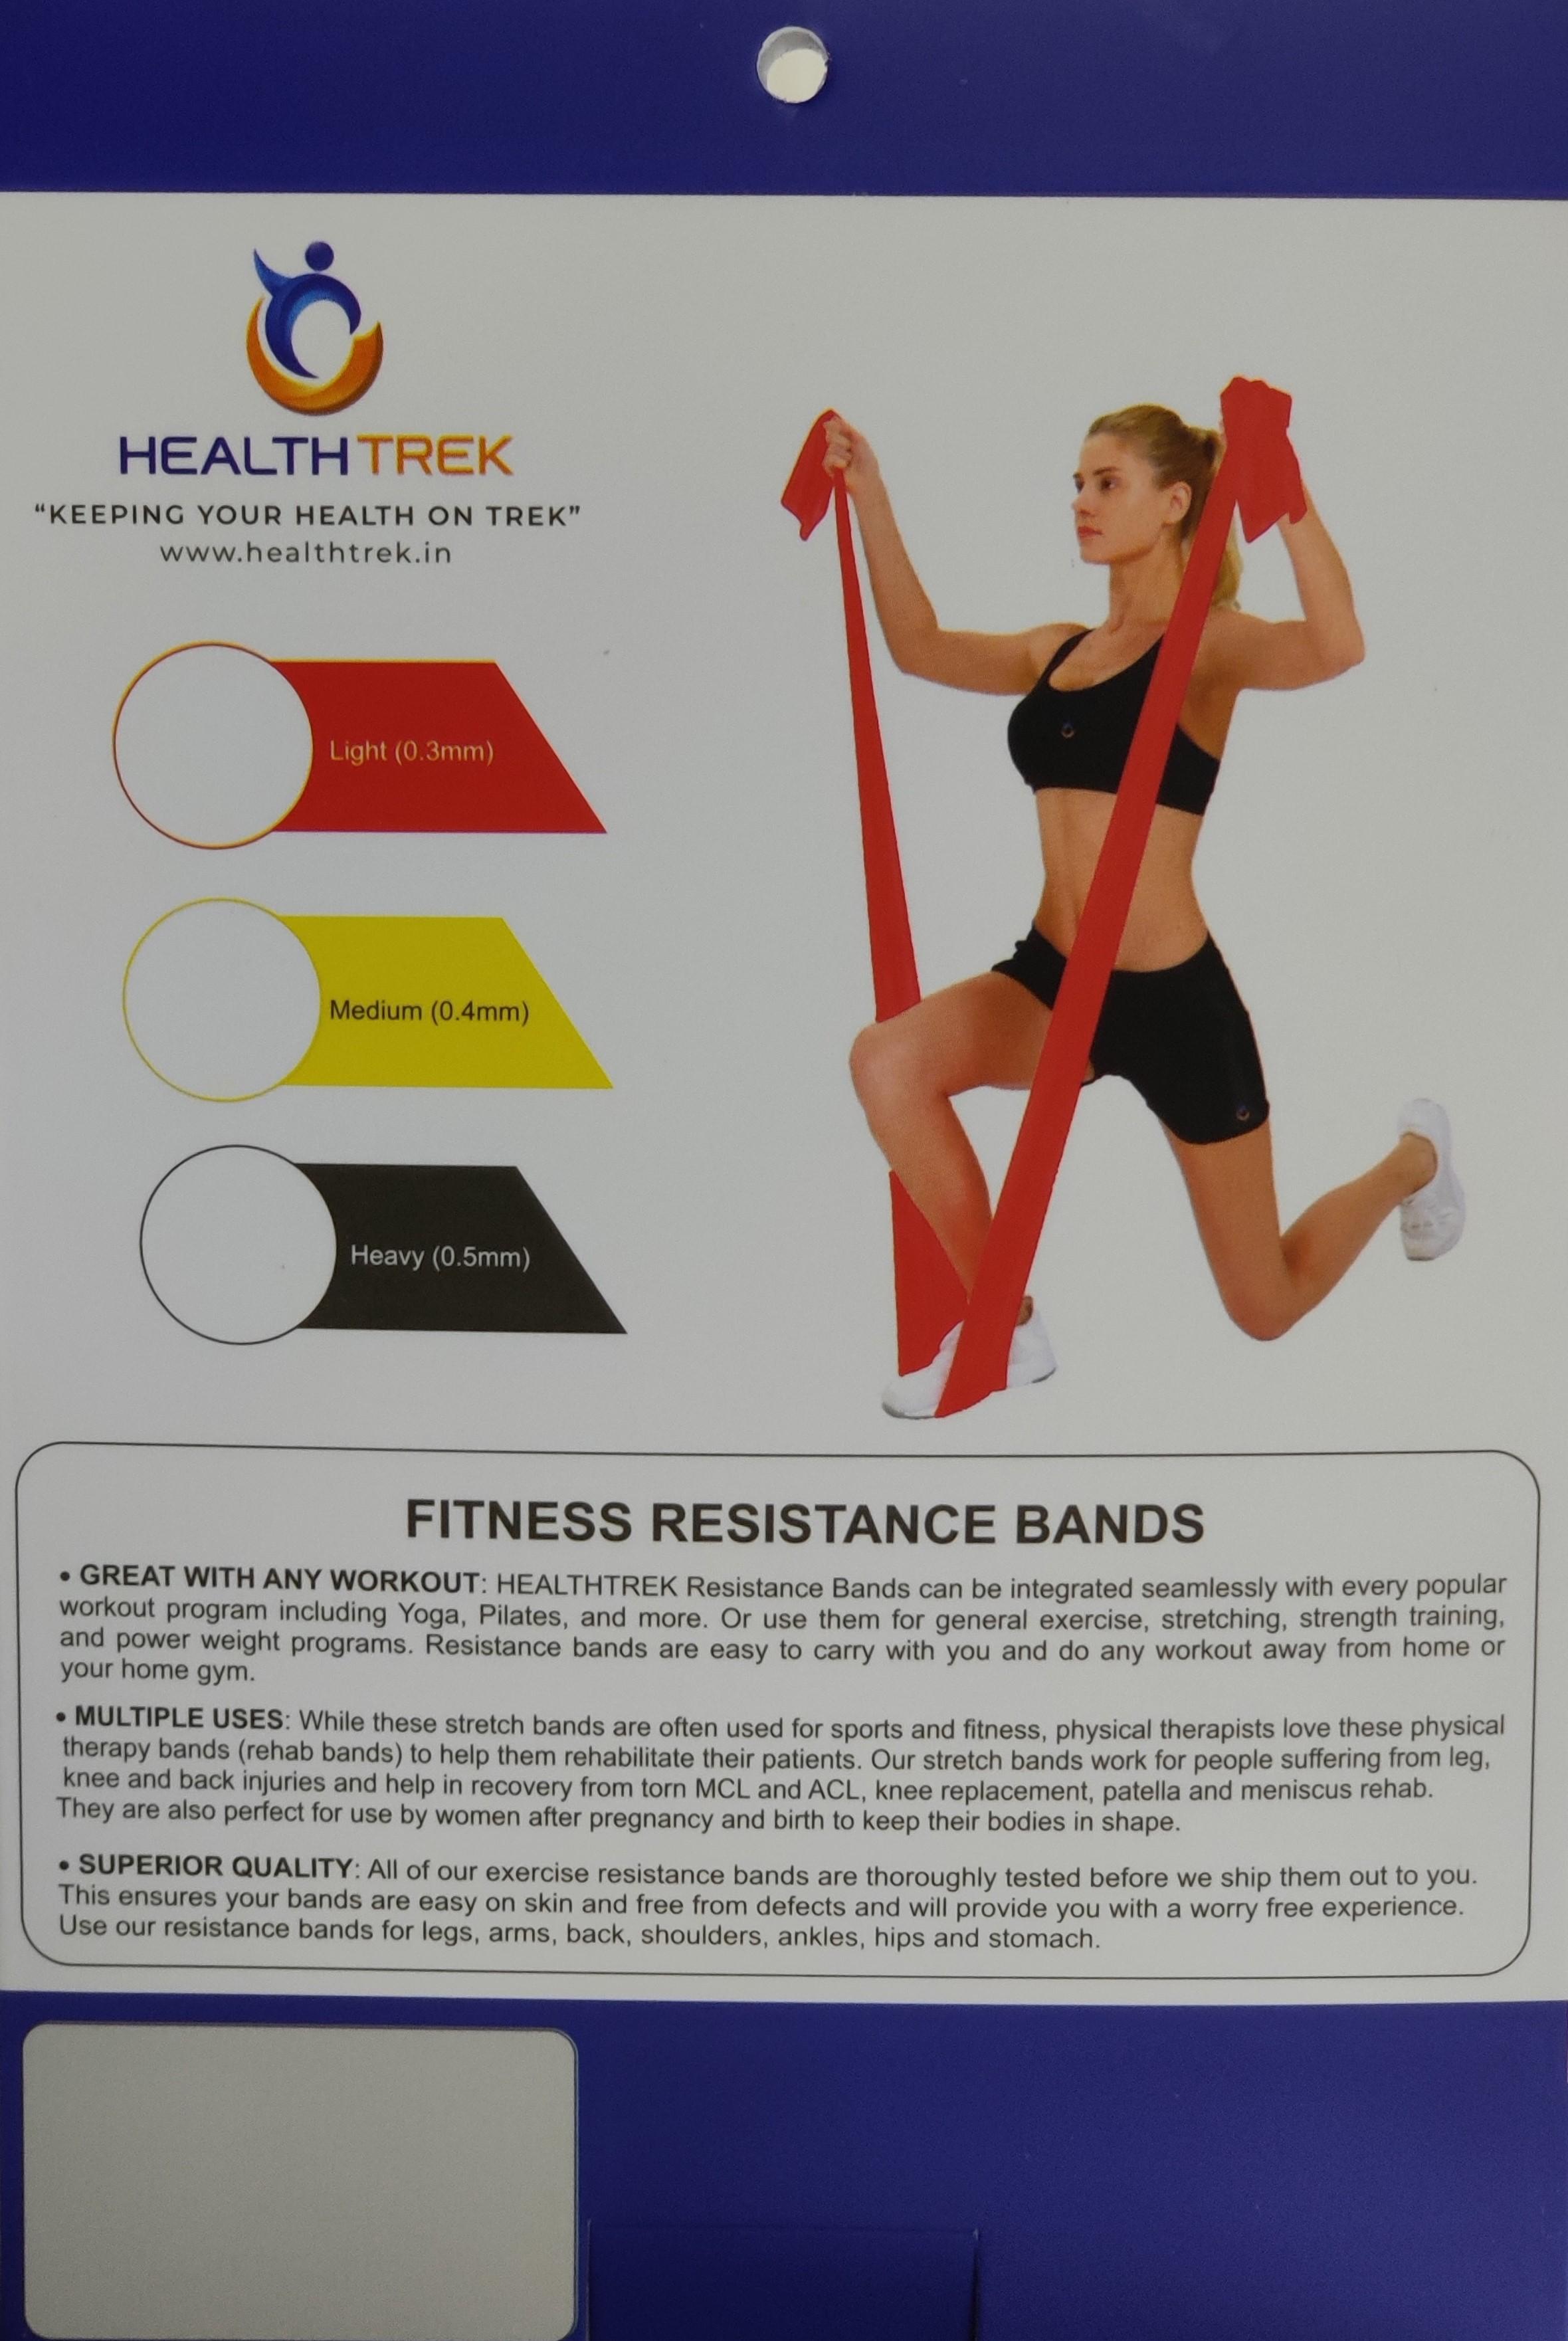 Healthtrek Fitness Resistance Band (Heavy)